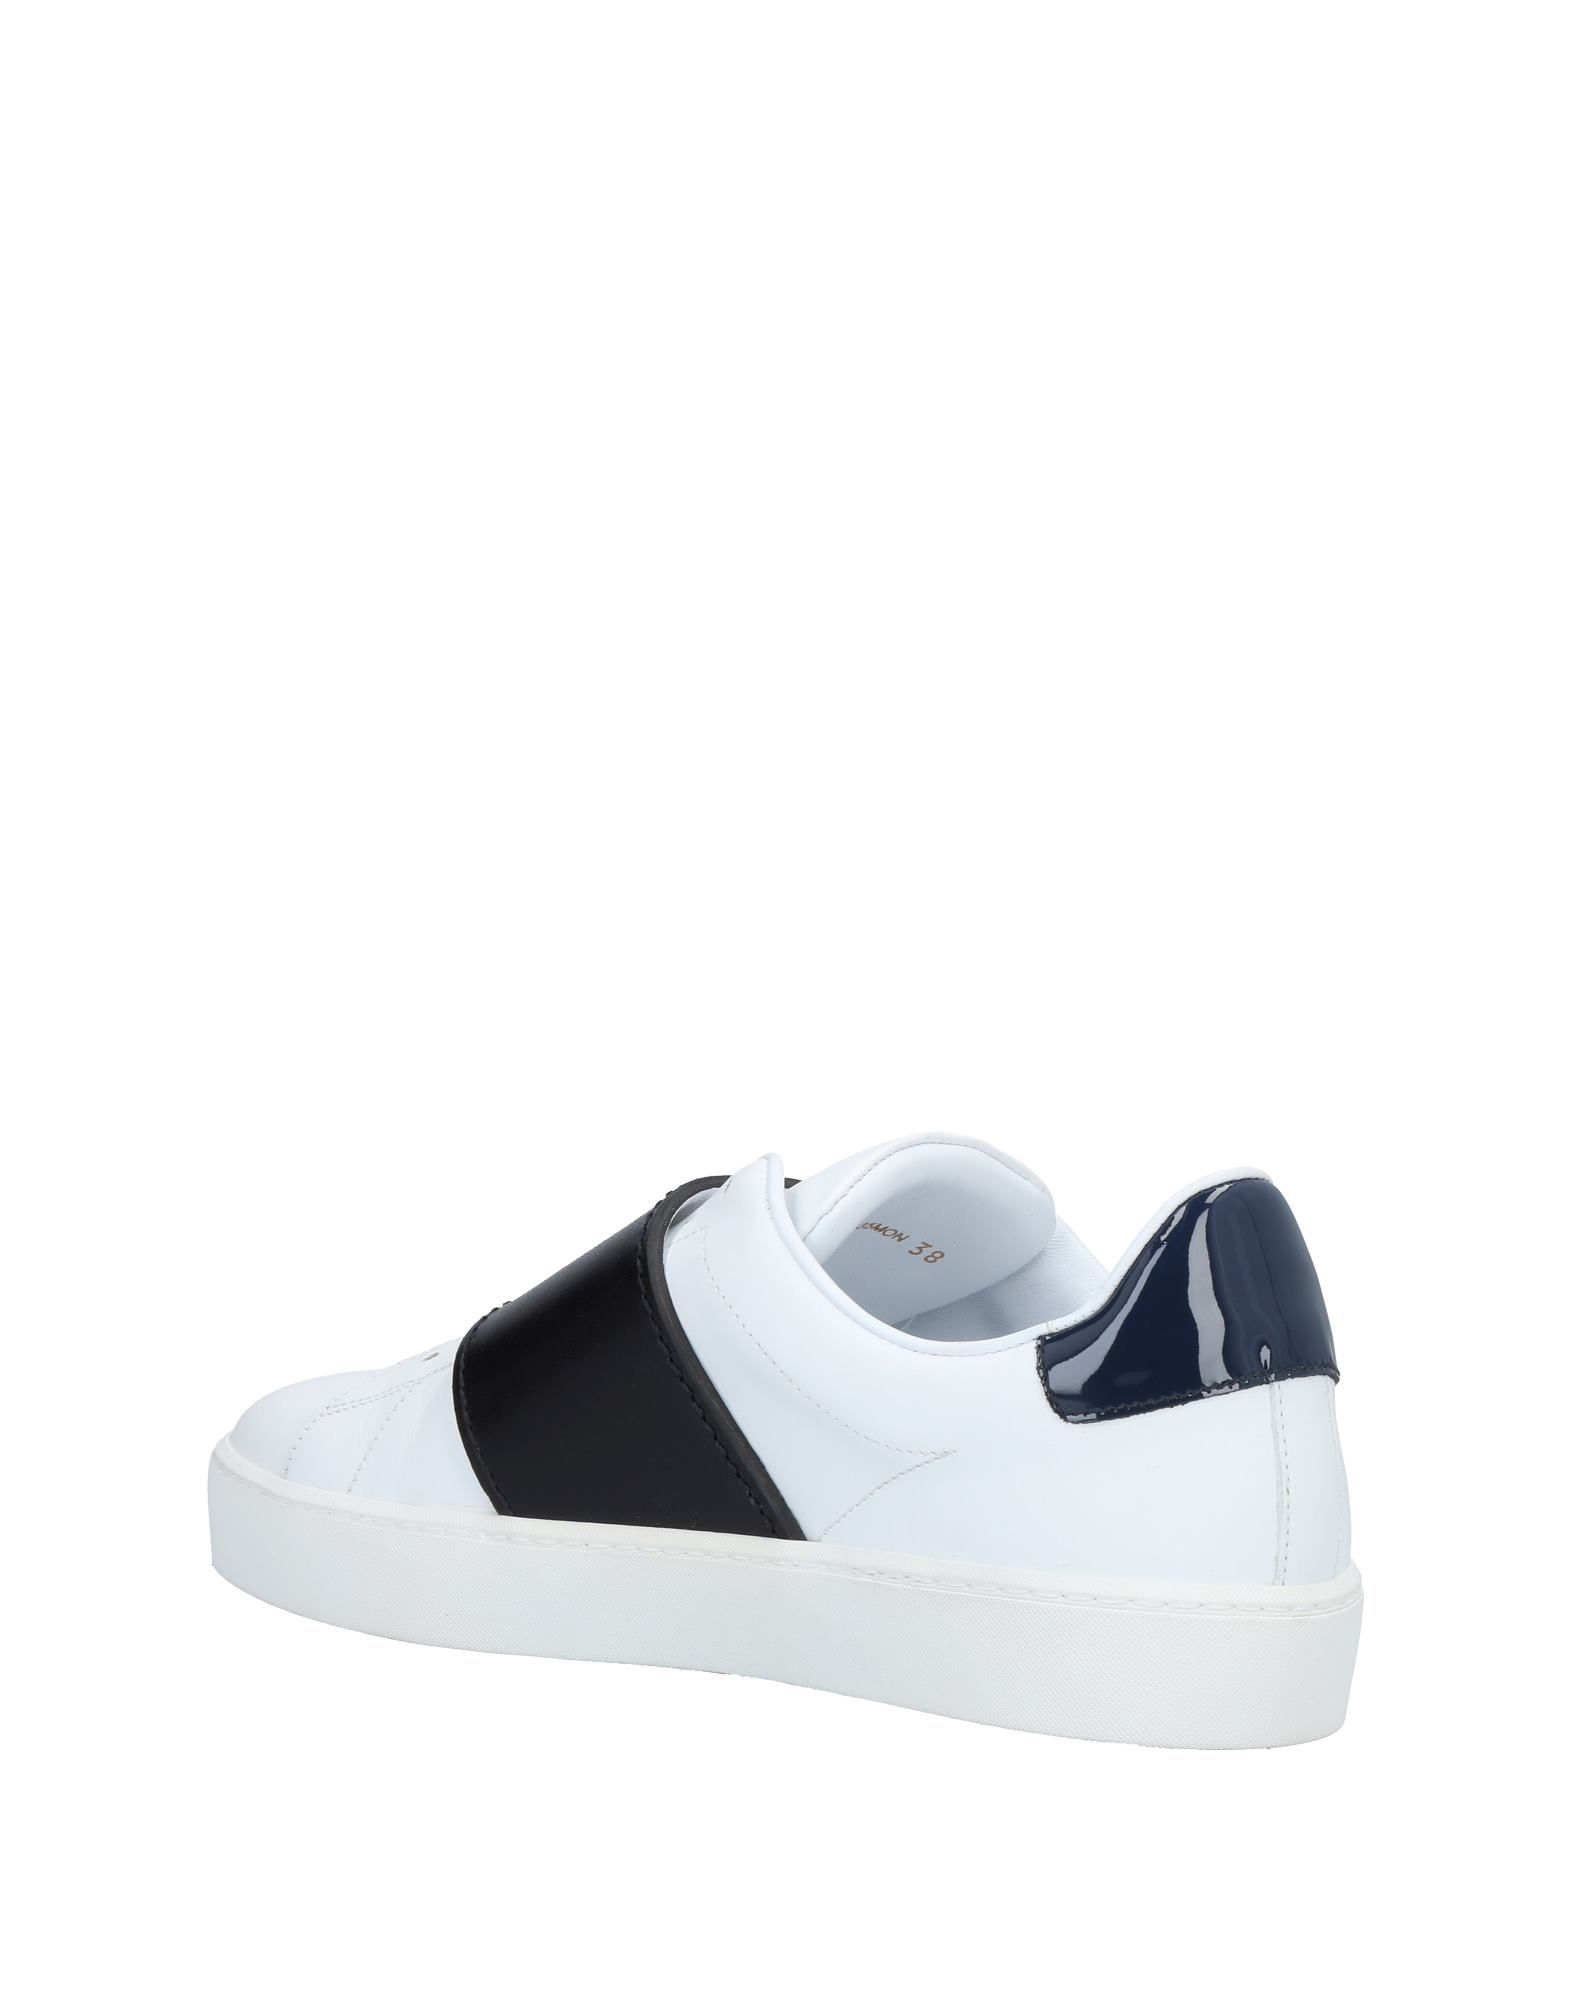 Burberry Sneakers Sneakers Burberry Damen  11477623NC Heiße Schuhe e4684b